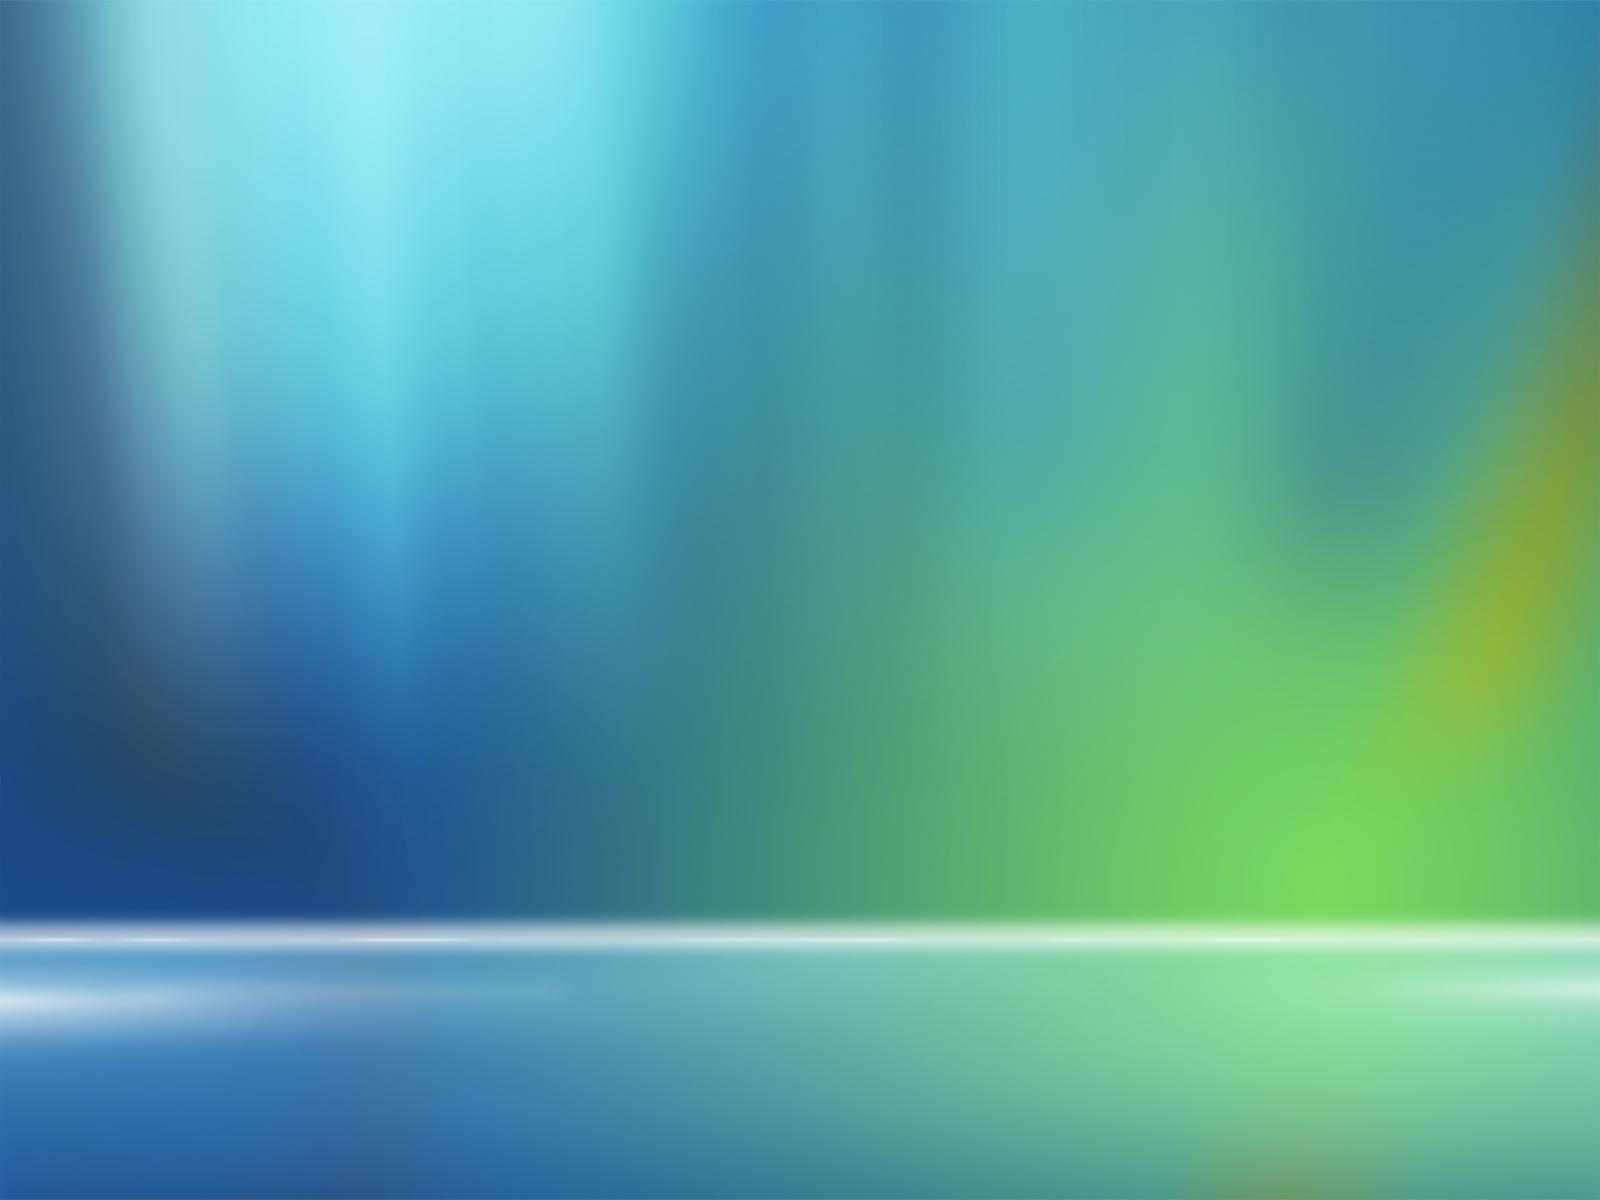 73 Windows Vista Wallpaper On Wallpapersafari